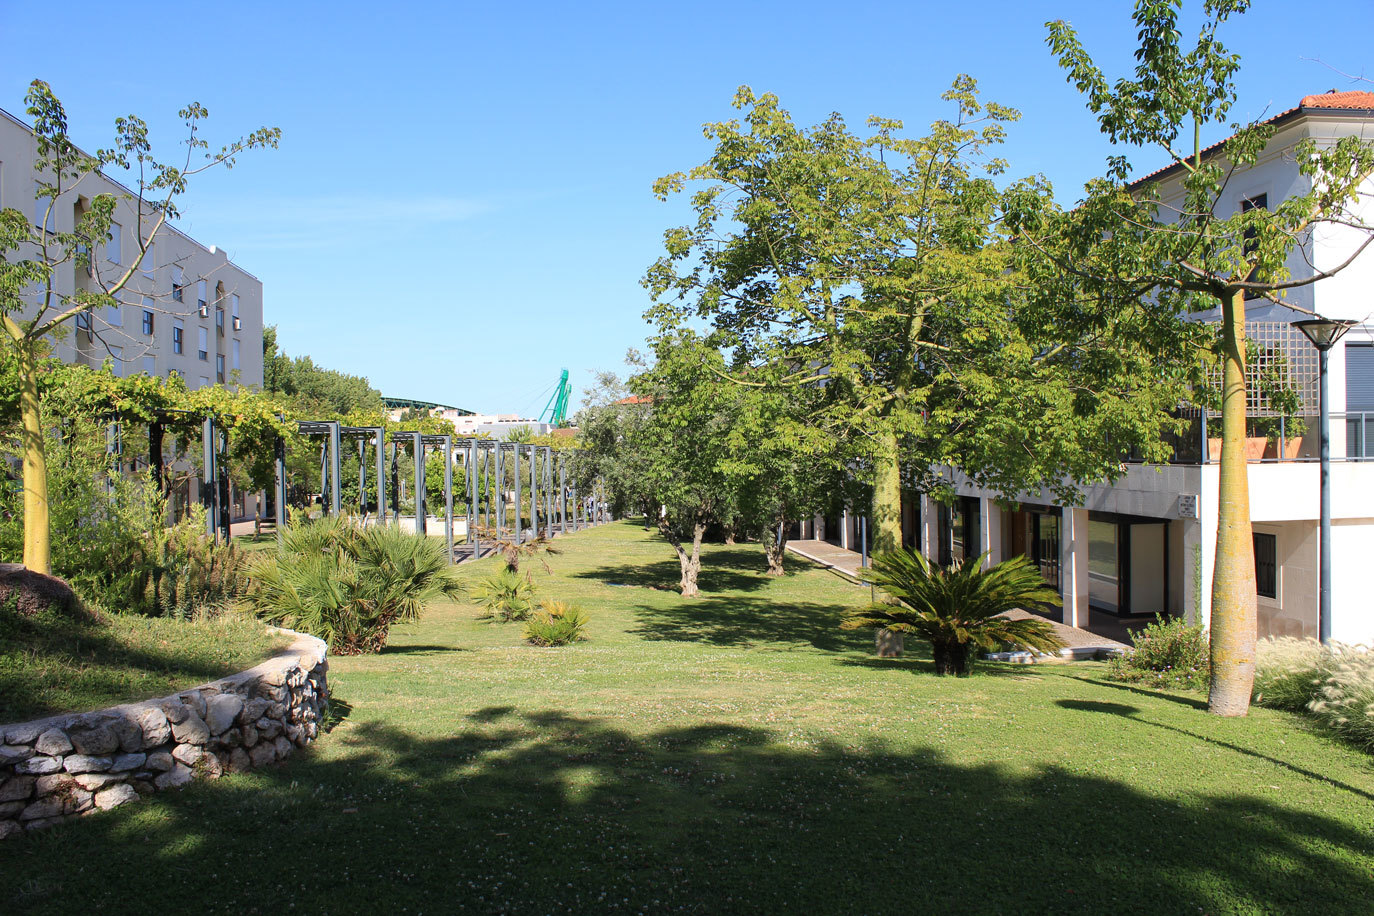 Jardim Prof. António de Sousa Franco